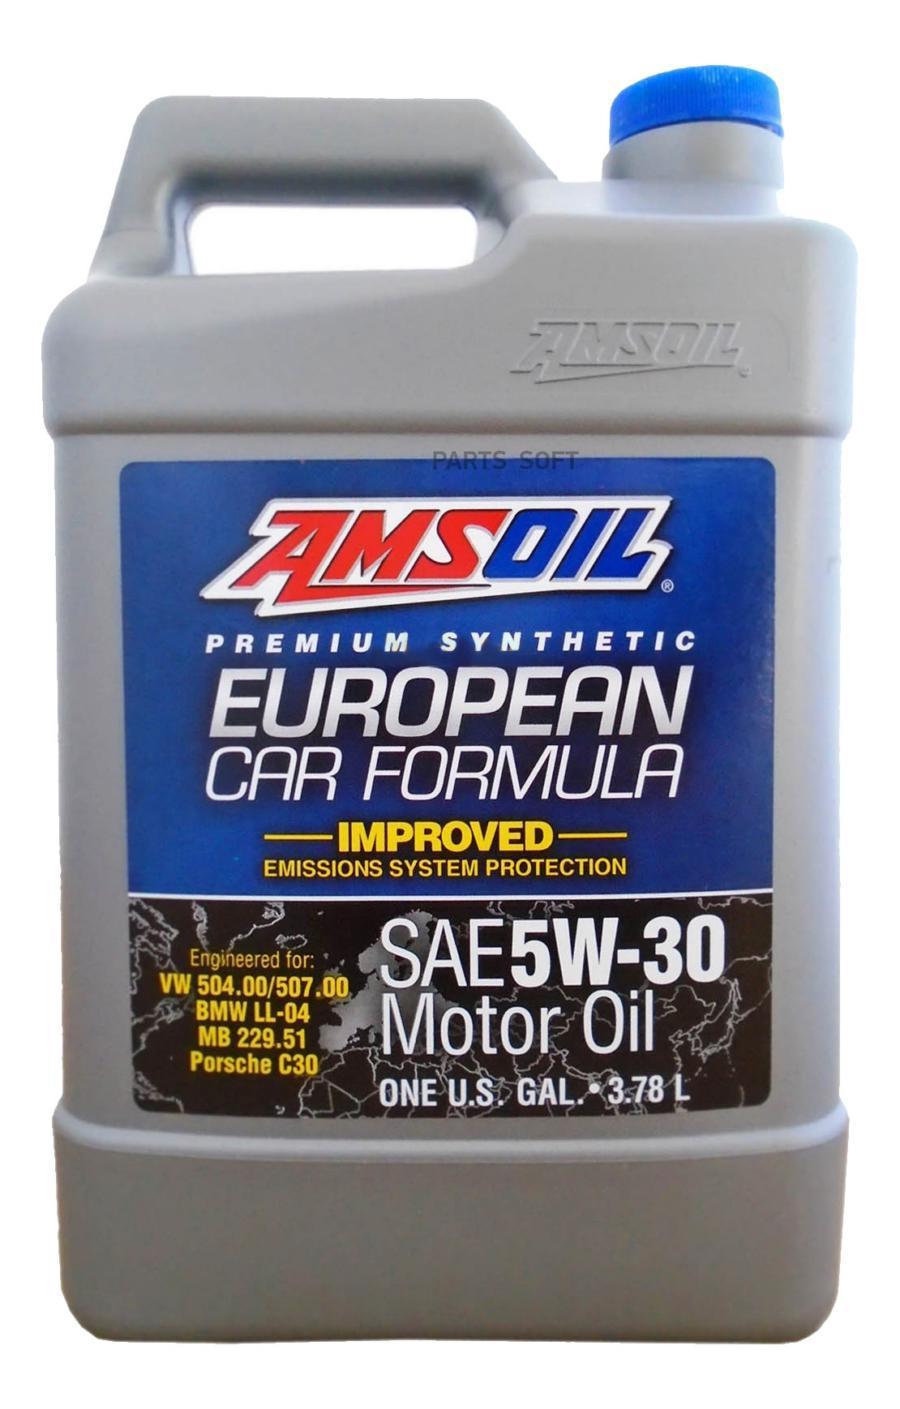 Масло моторное синтетическое European Car Formula Low-SAPS Synthetic Motor Oil 5W-30, 3,784л